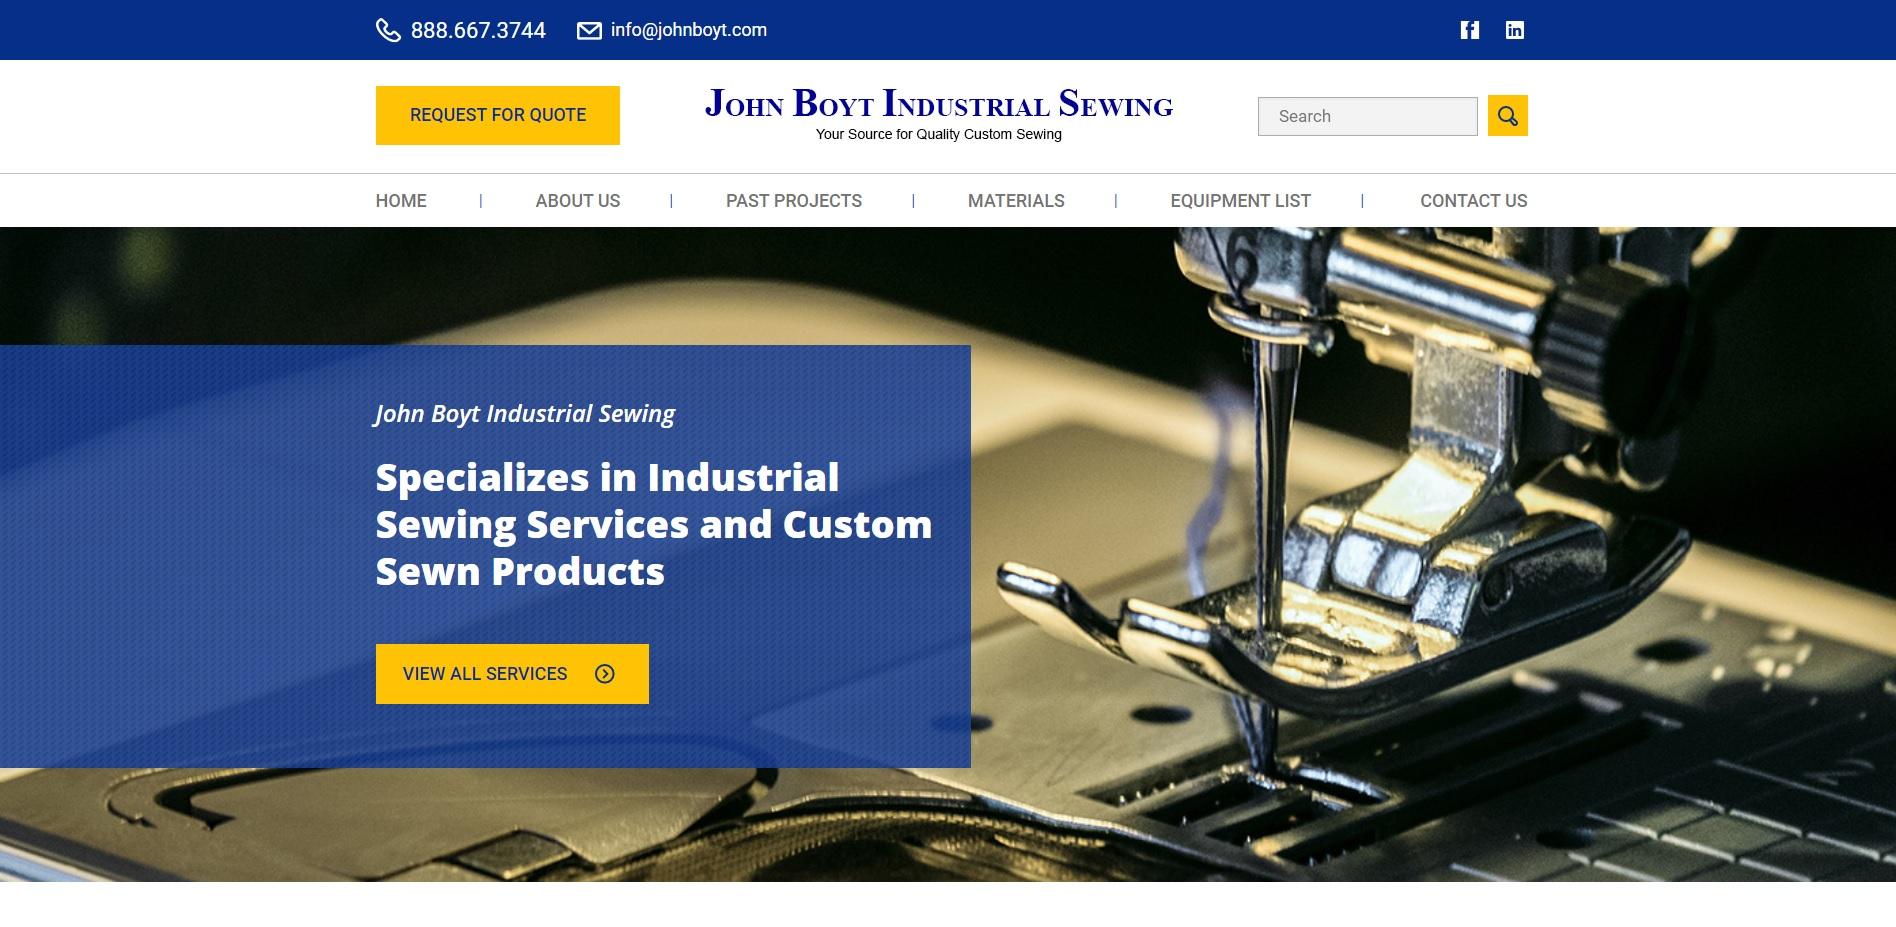 John Boyt Industrial Sewing